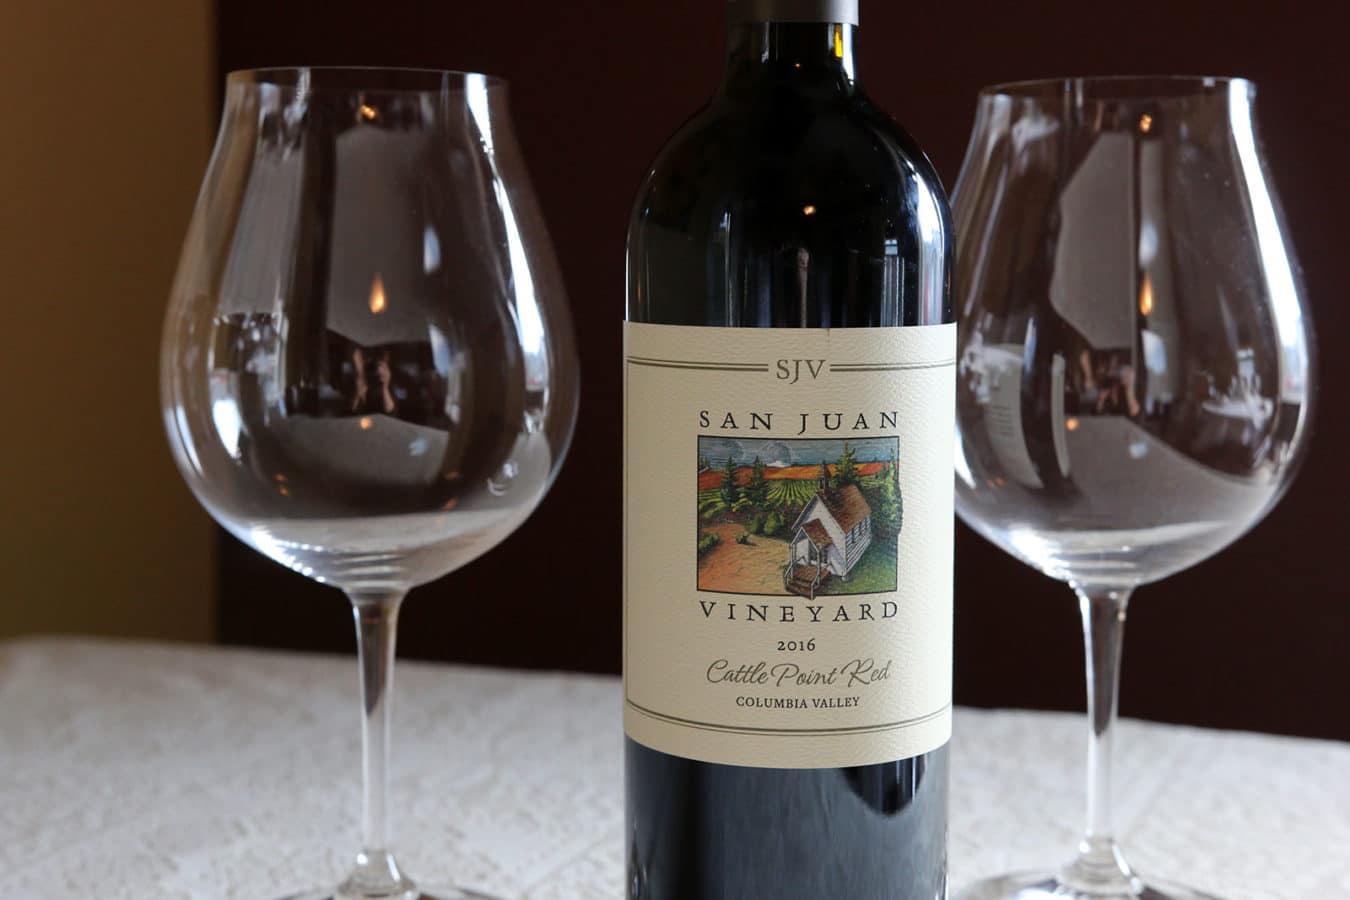 San Juan Vineyard